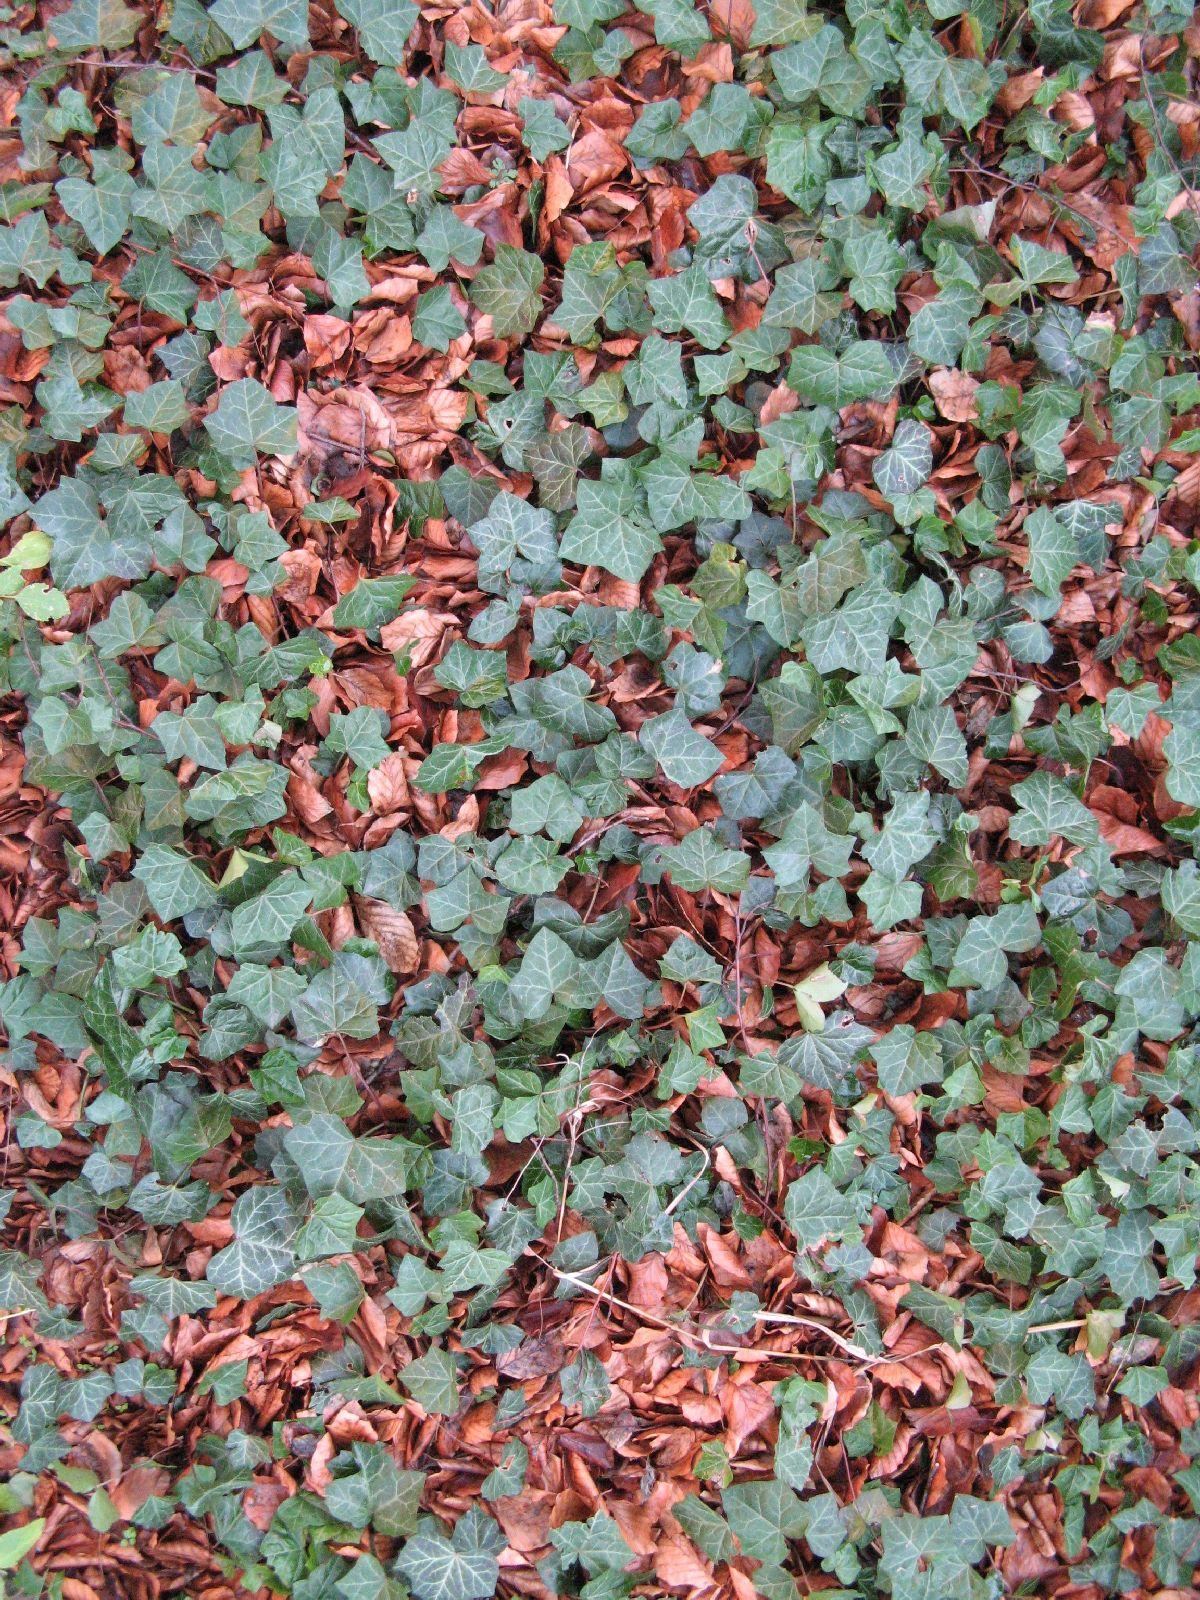 Boden-Gras-Moos-Blumen_Textur_B_02736